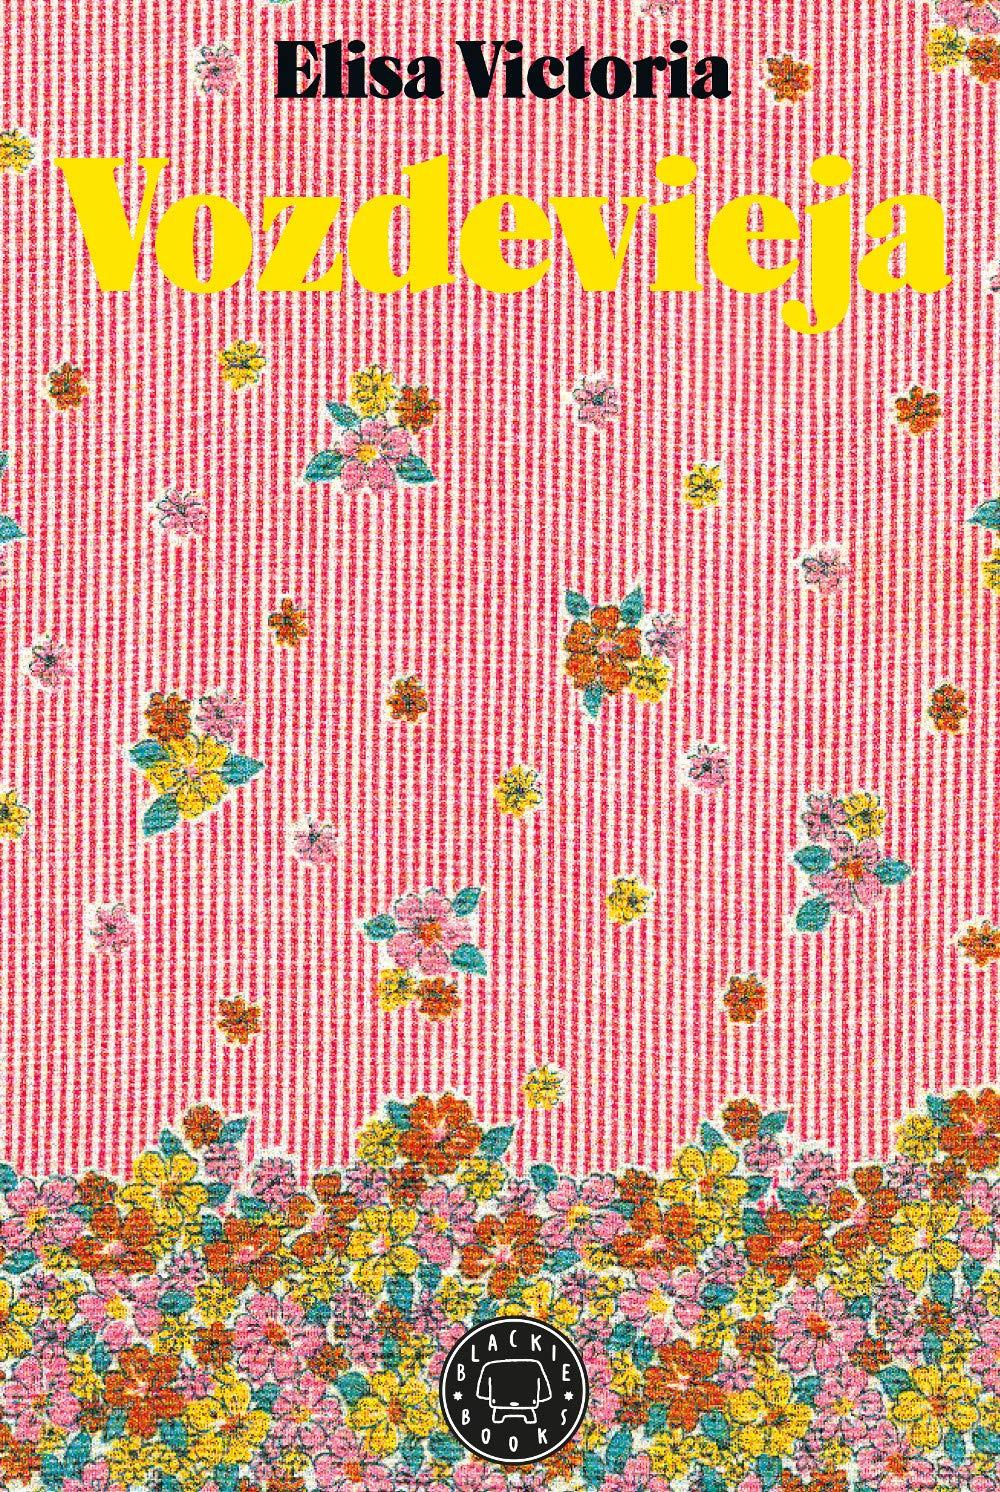 Vozdevieja, la primera novela de Elisa Victoria